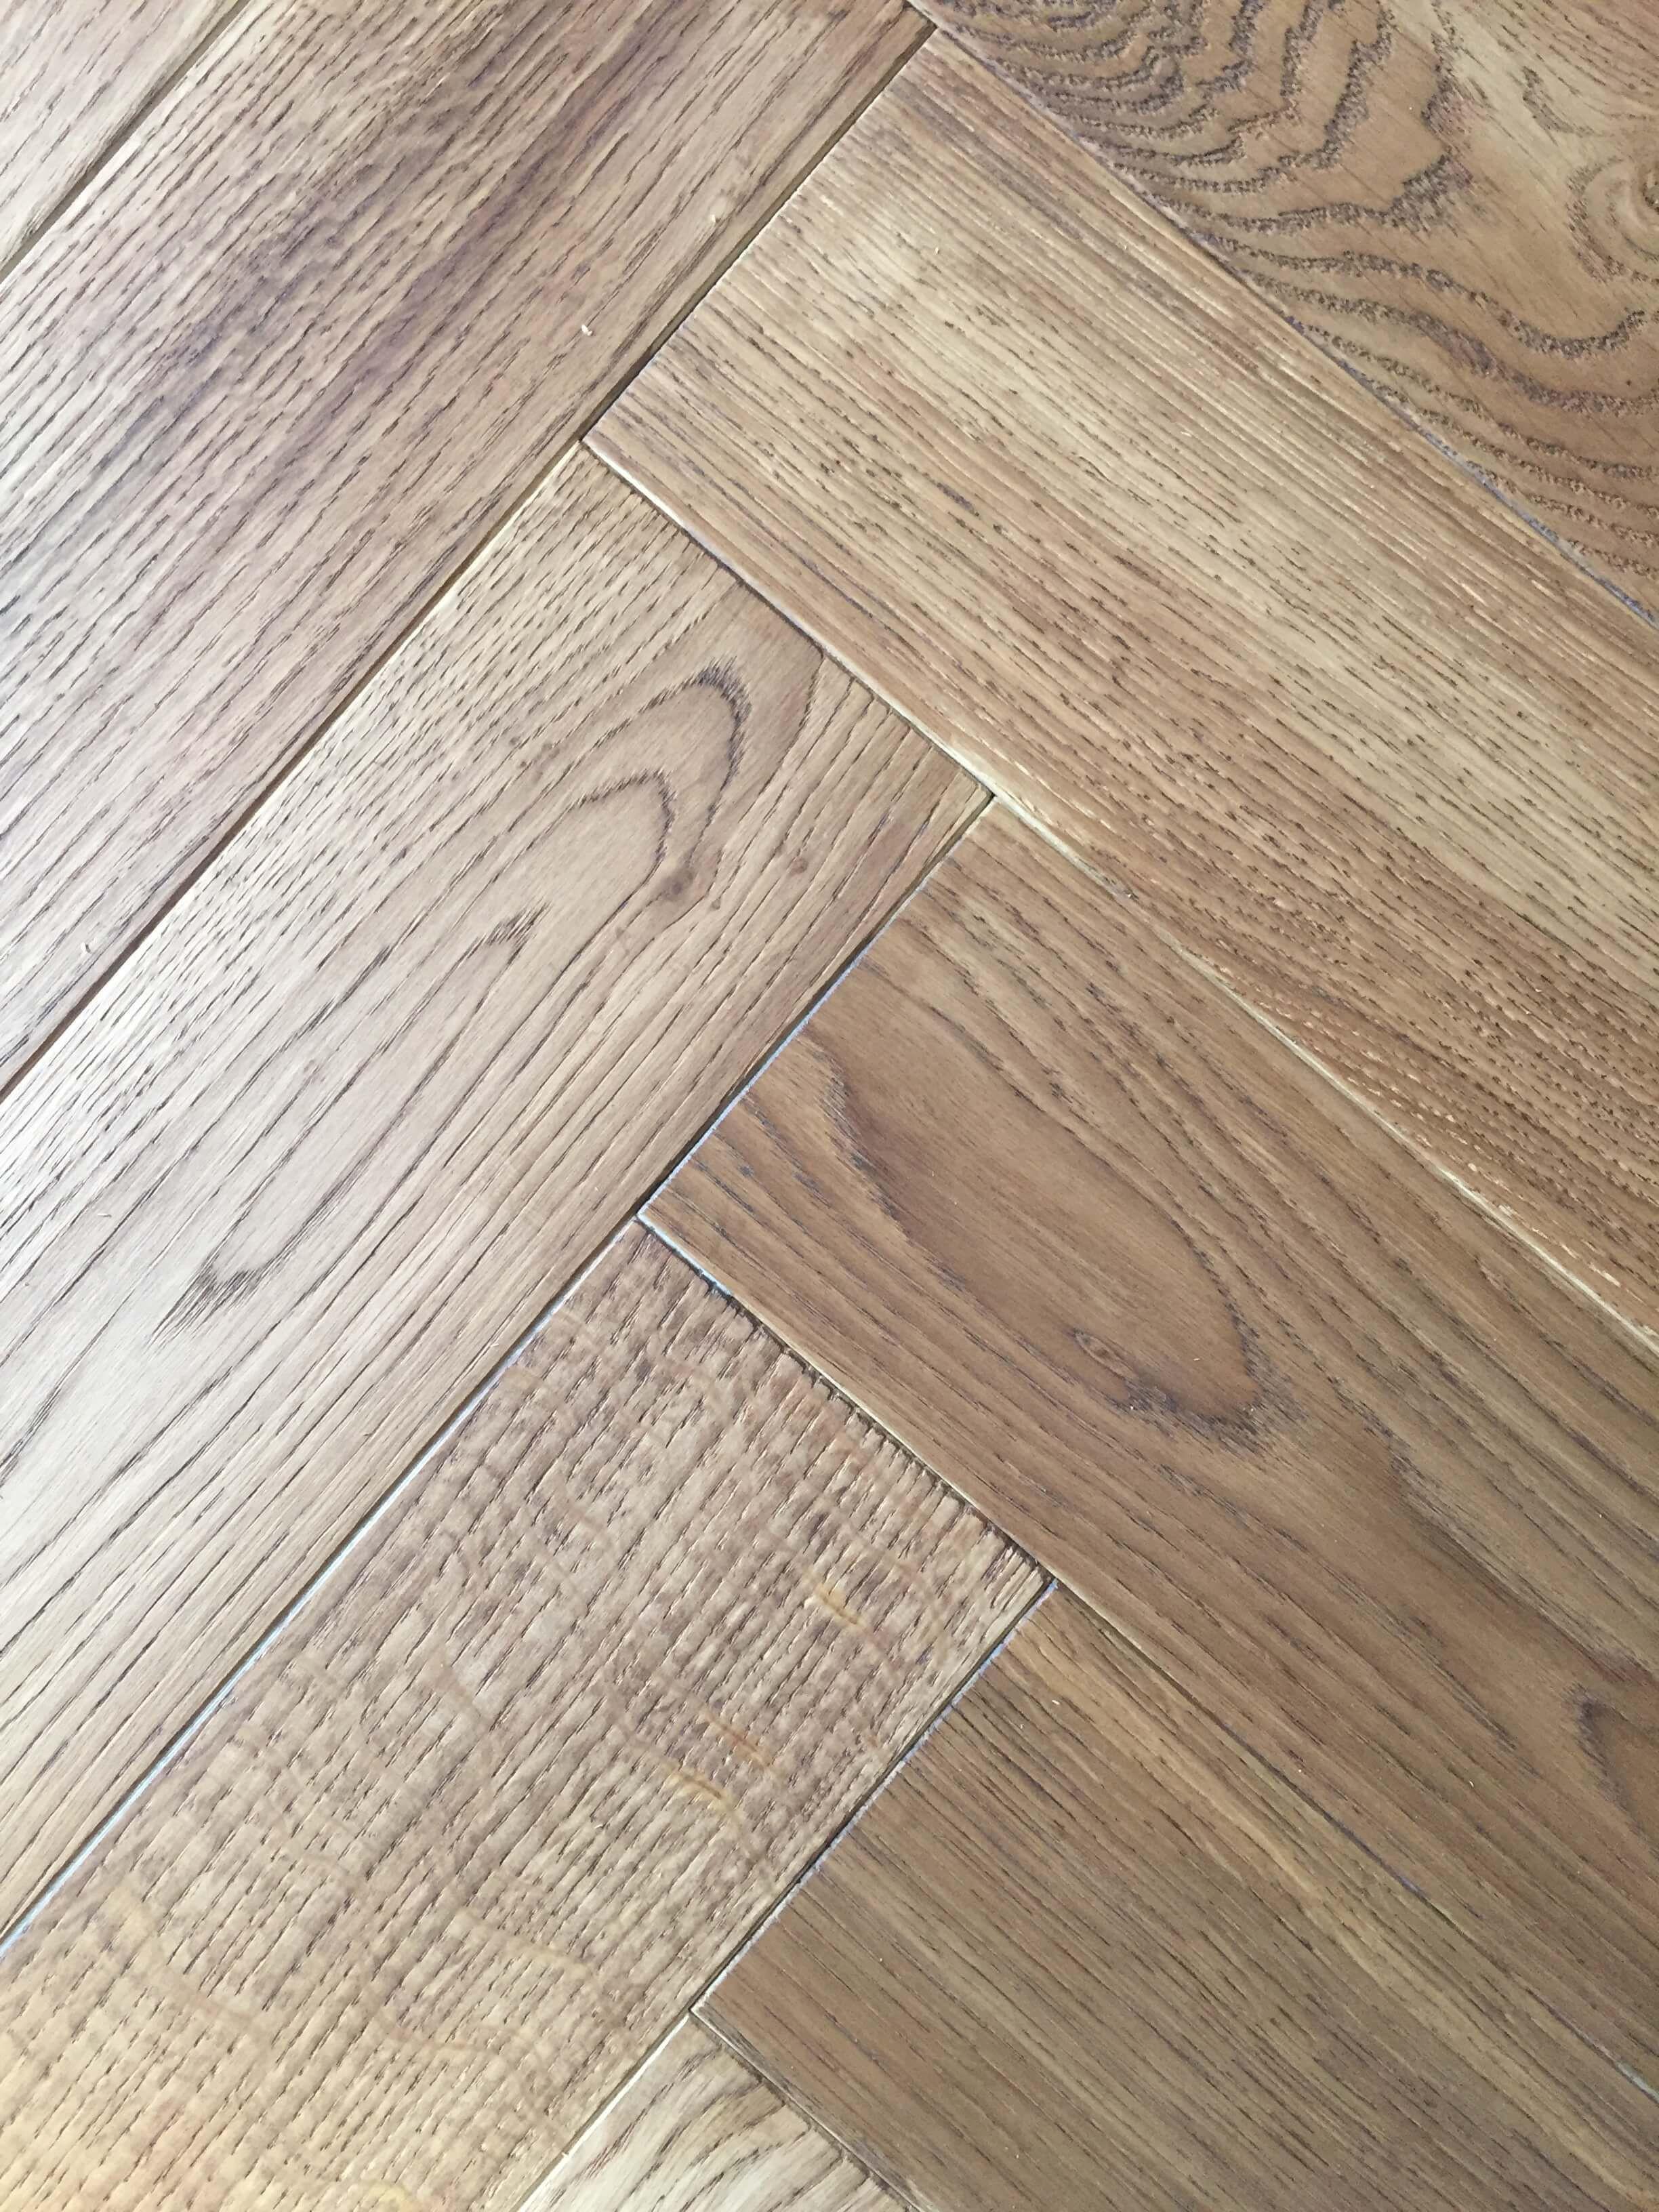 polyurethane finish hardwood floors of engineered wood flooring hard wearing wood floor finish floor plan for engineered wood flooring new decorating an open floor plan living room awesome design plan 0d